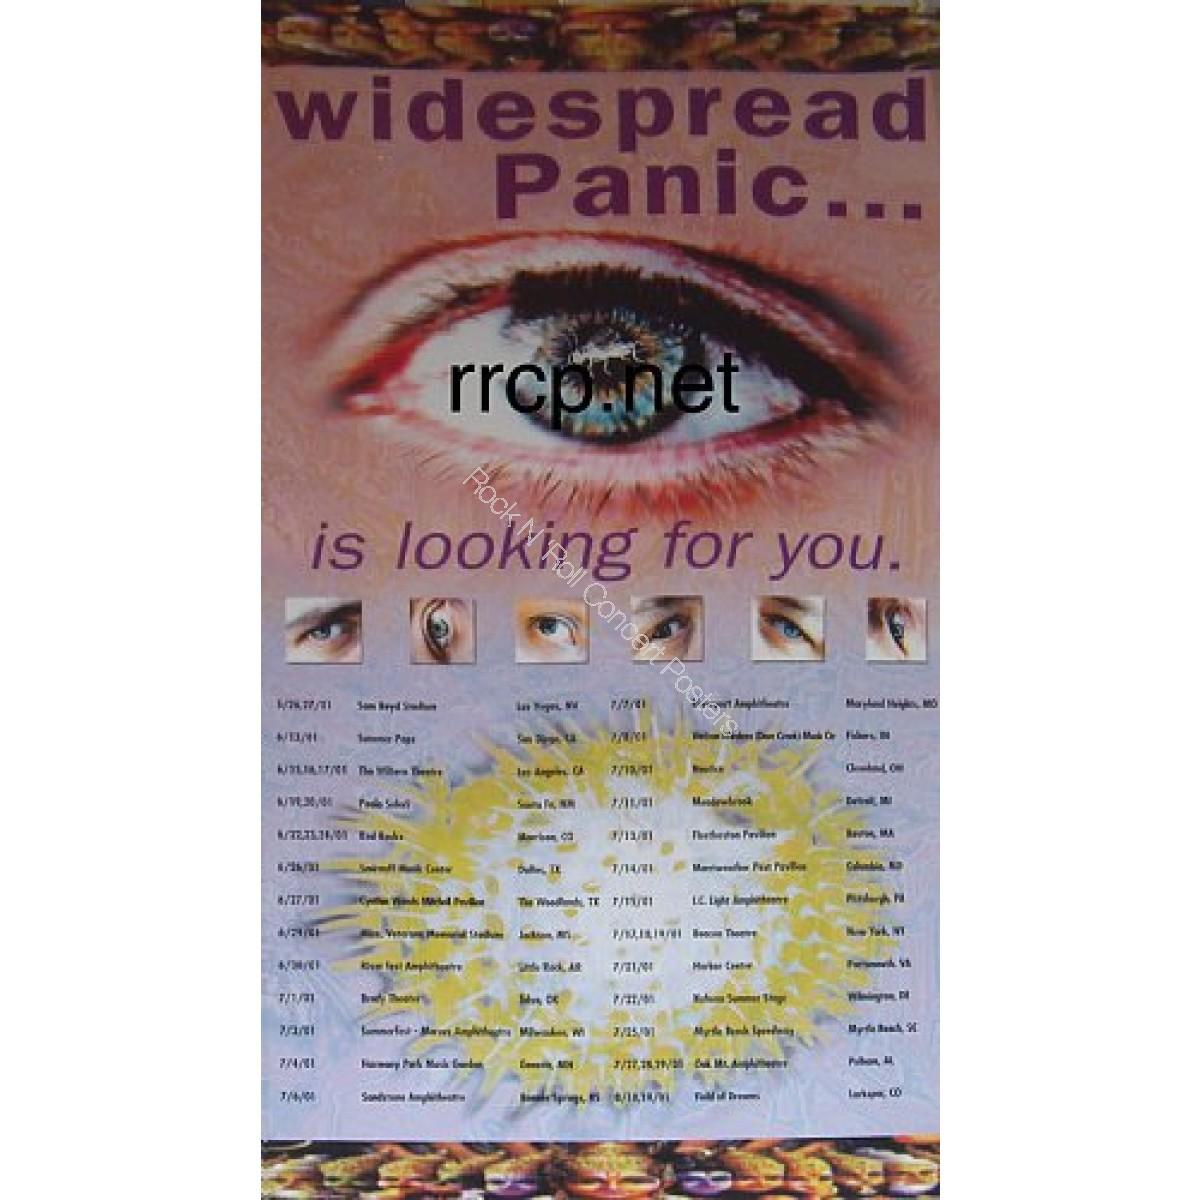 Widespread Panic Summer Tour 2001